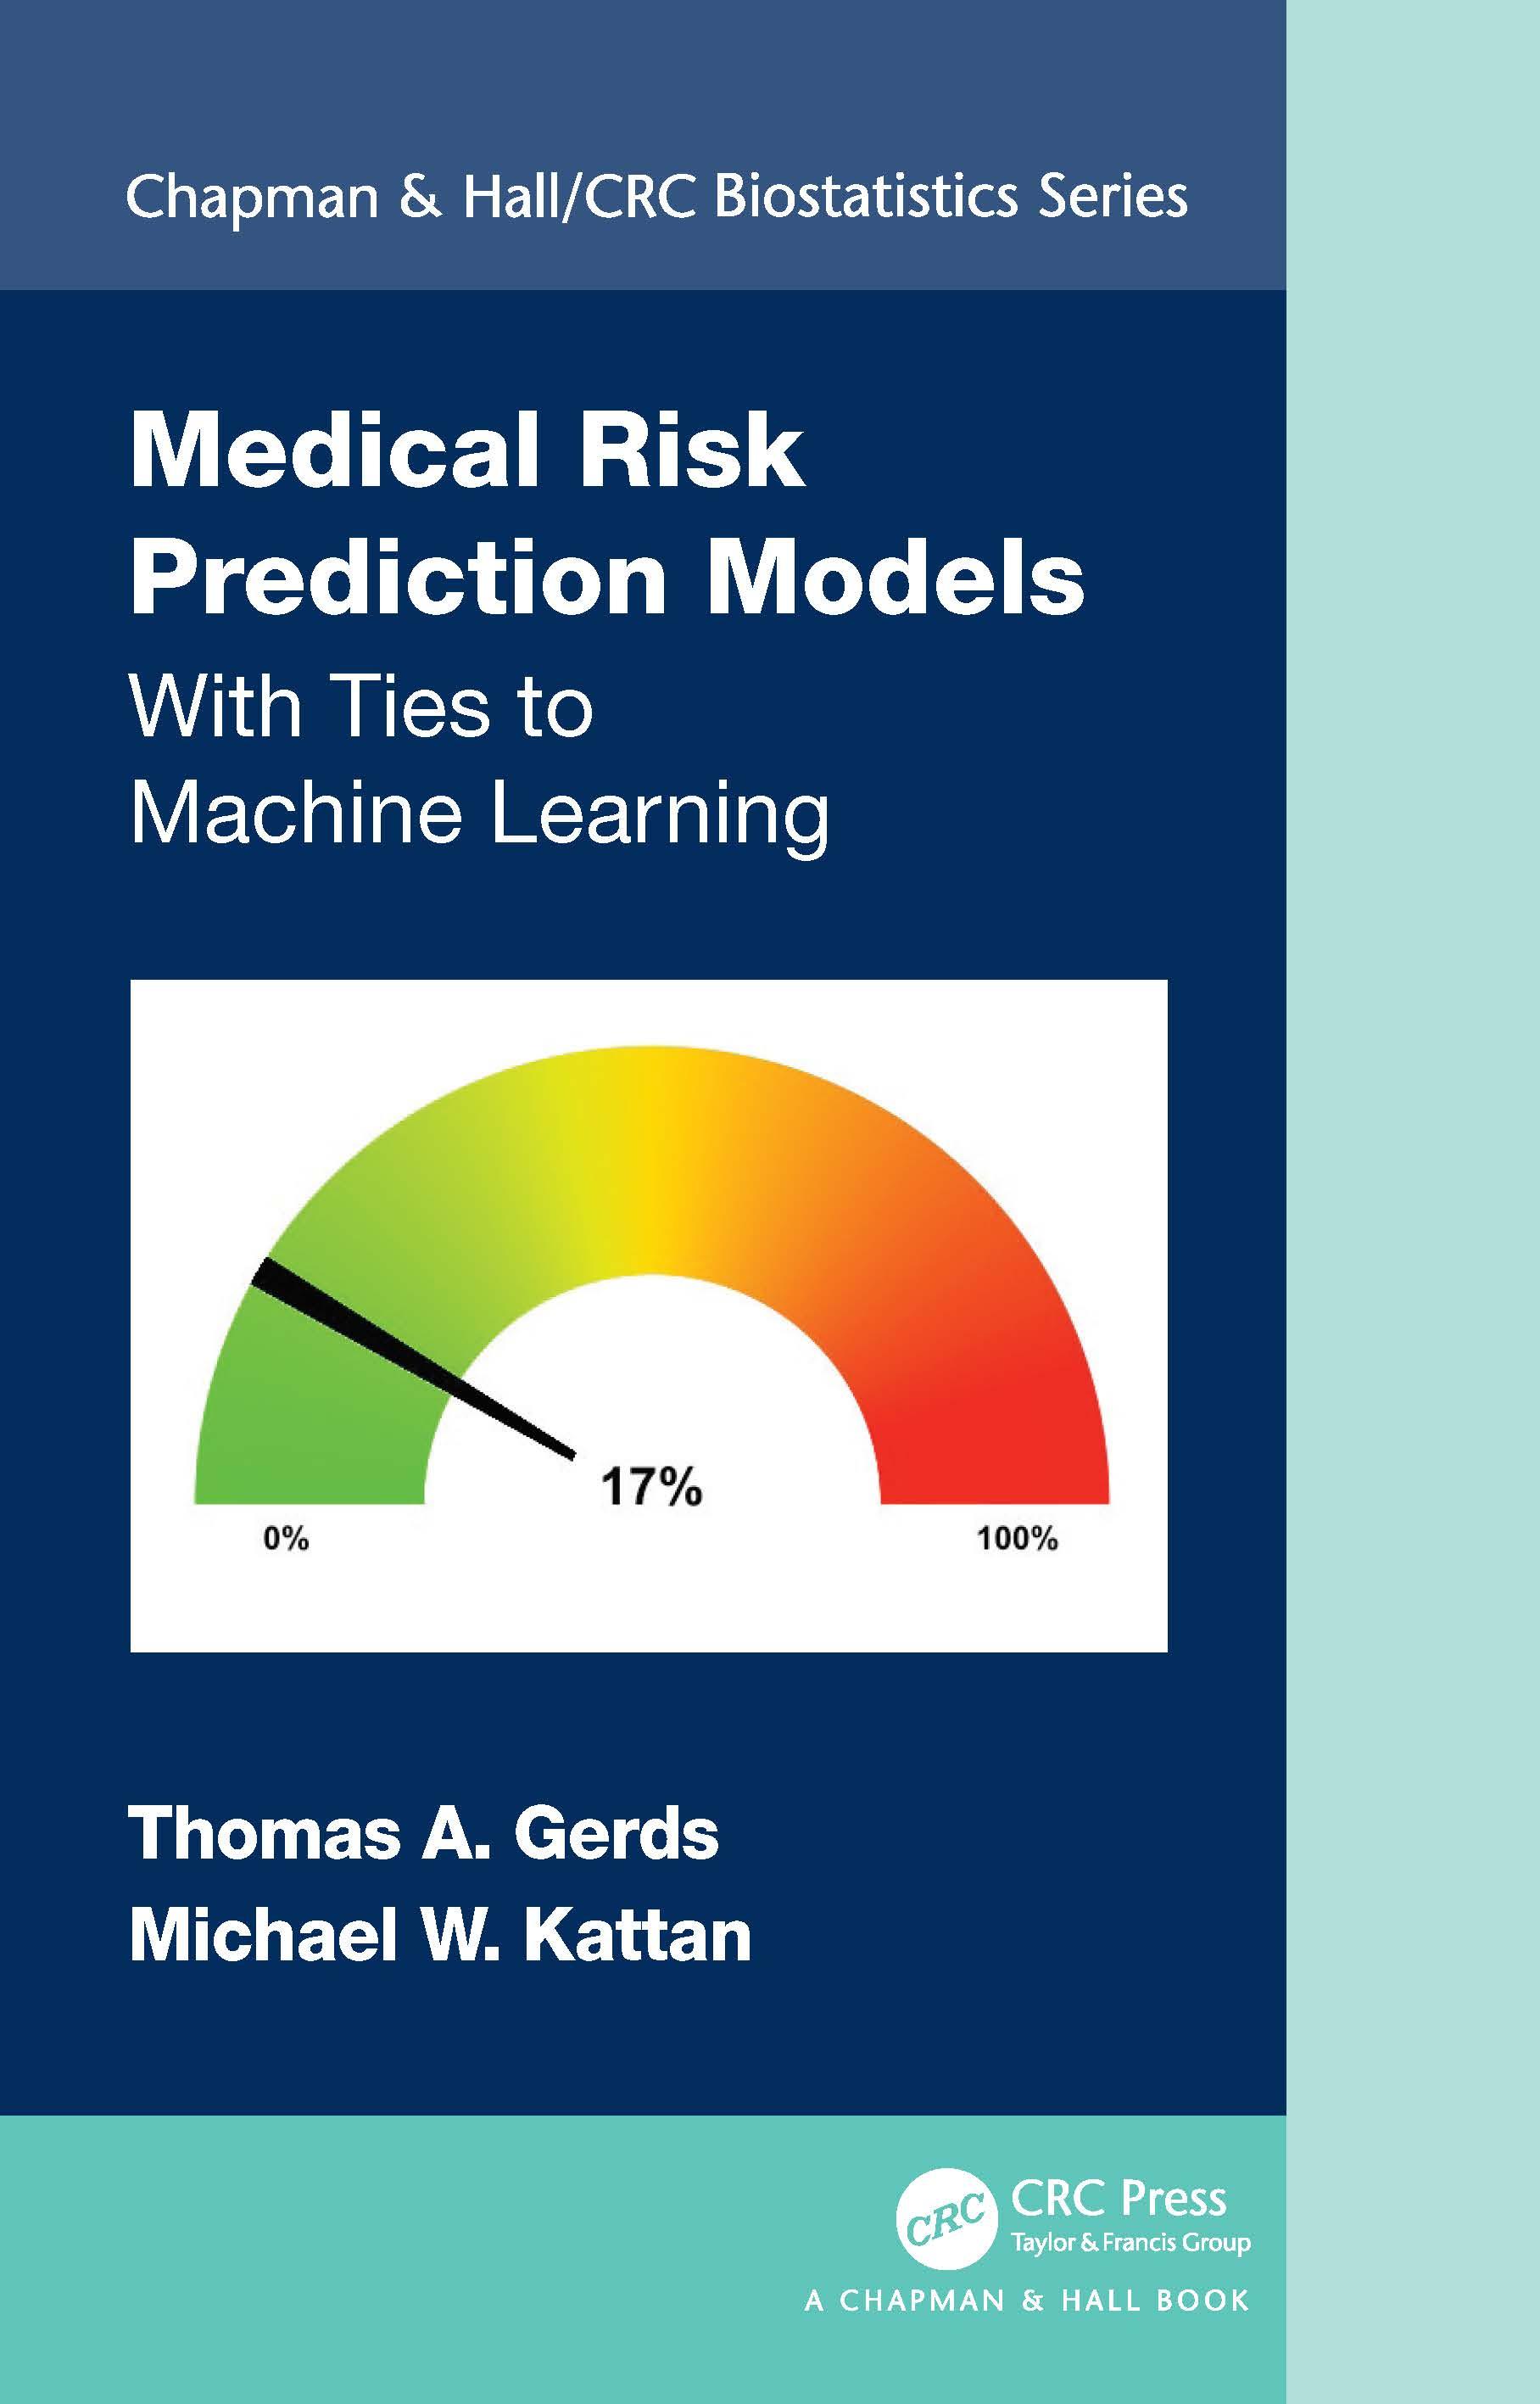 Medical Risk Prediction